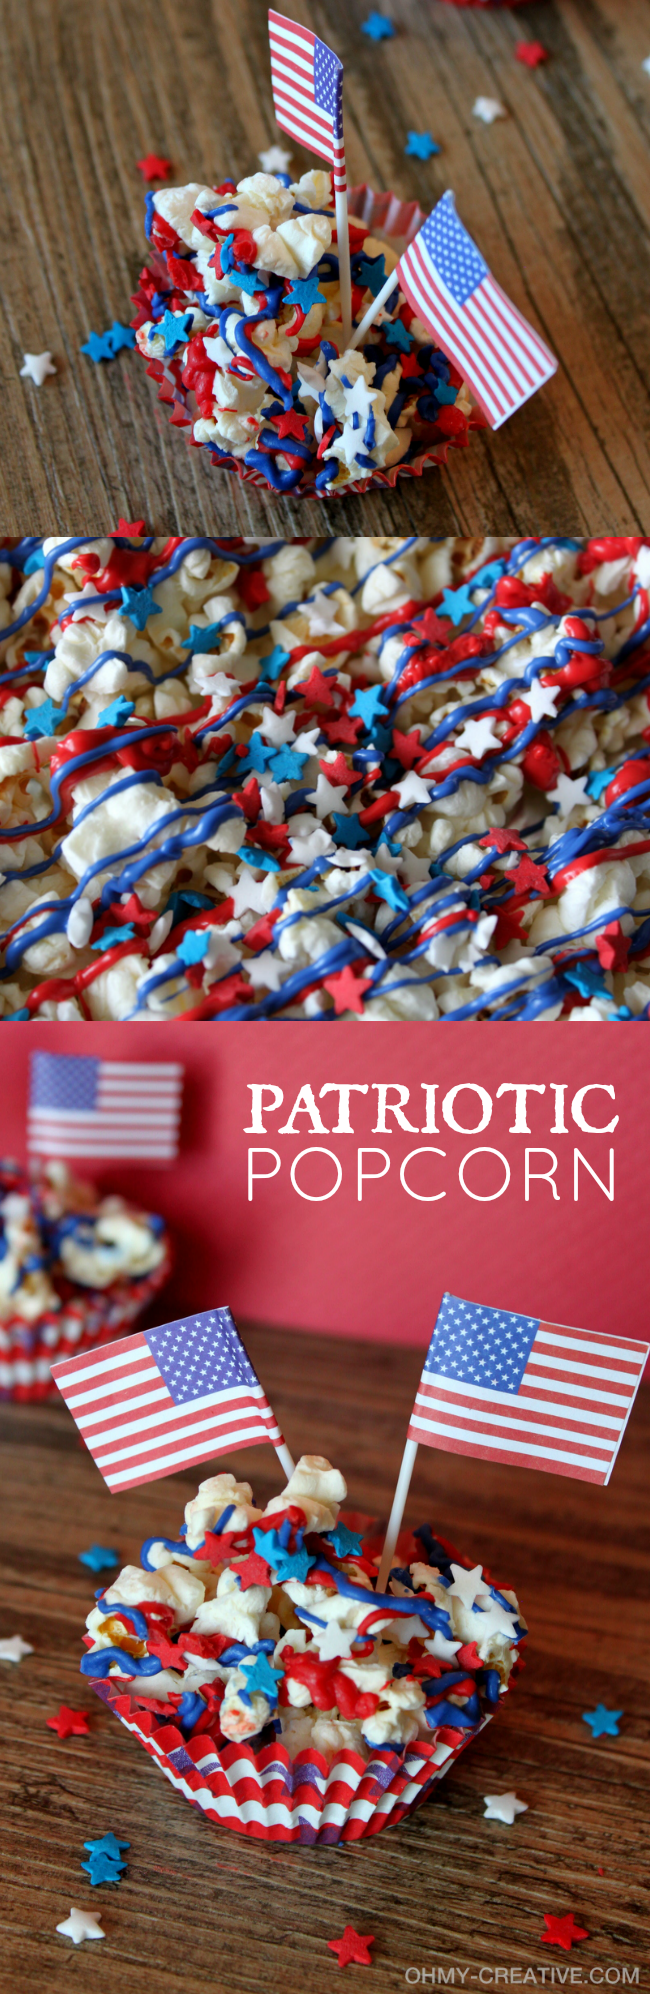 Stars And Stripes Patriotic Popcorn Oh My Creative